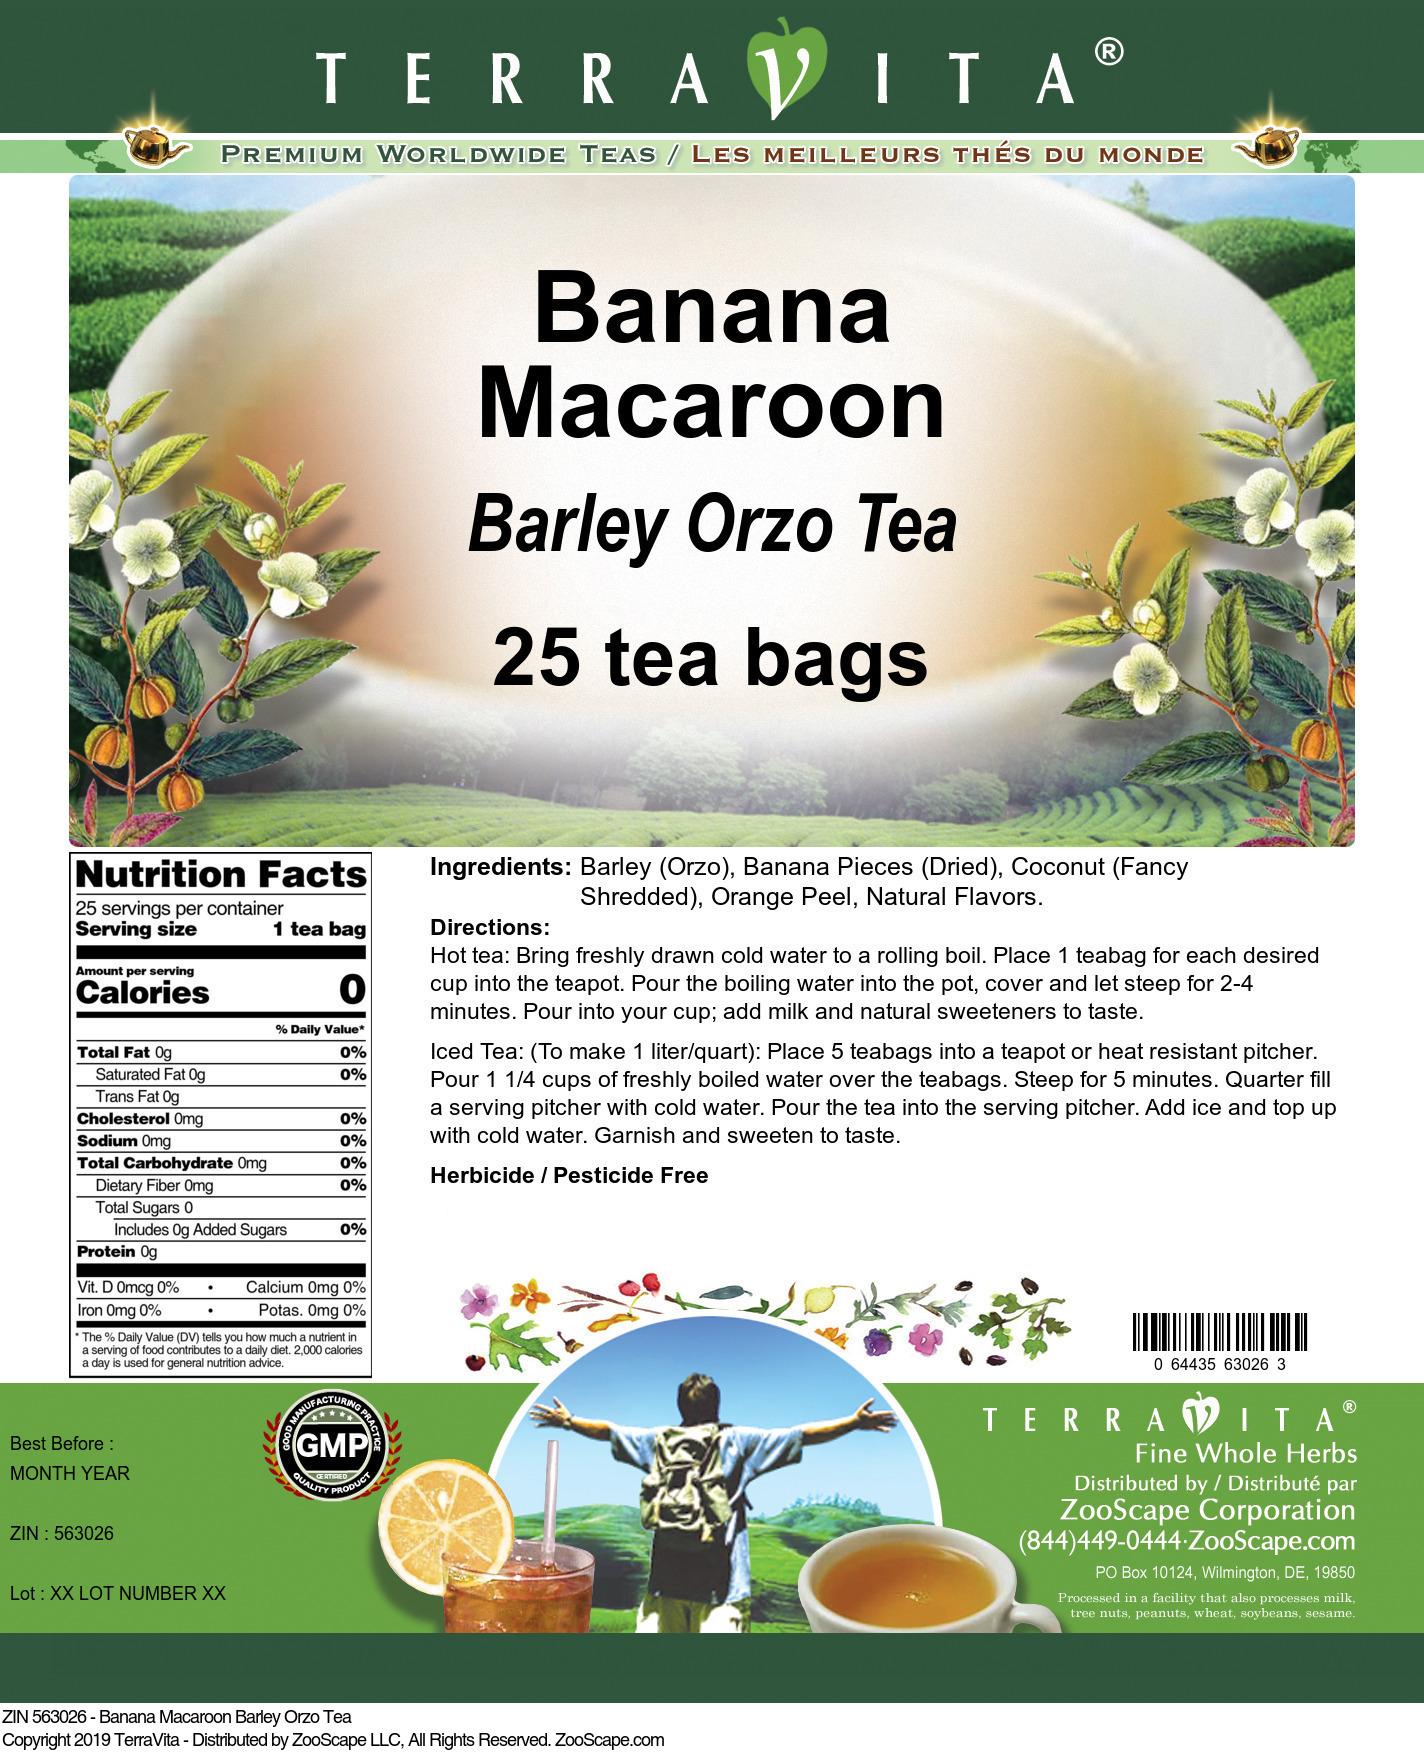 Banana Macaroon Barley Orzo